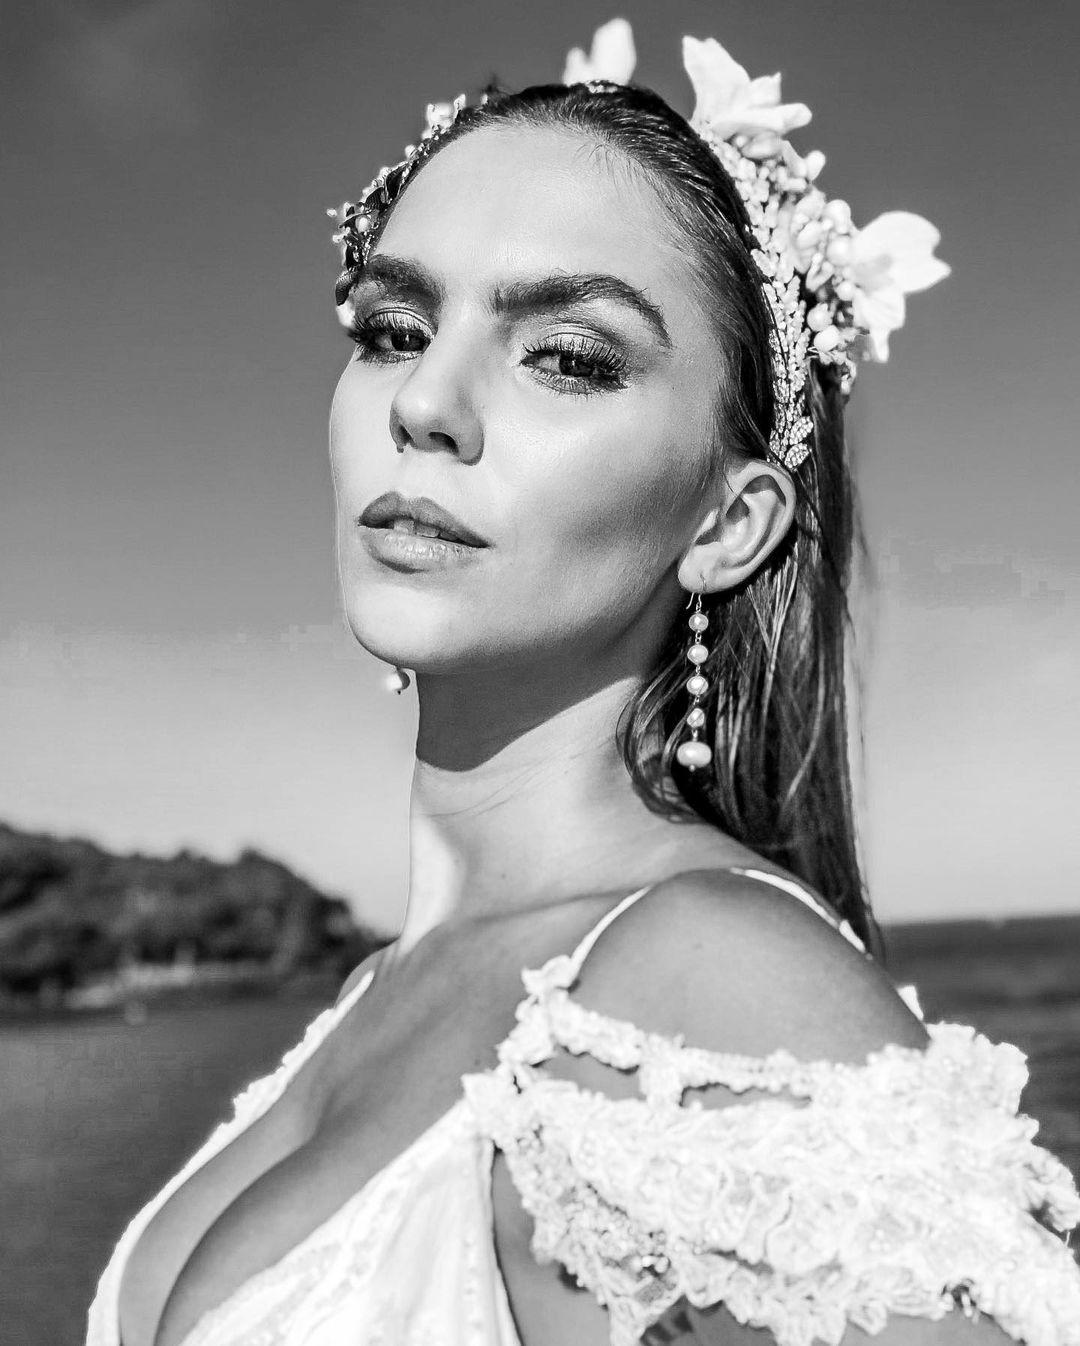 ana flavia giacomini, miss ilha dos lobos mundo 2019. - Página 2 Fvoltx10